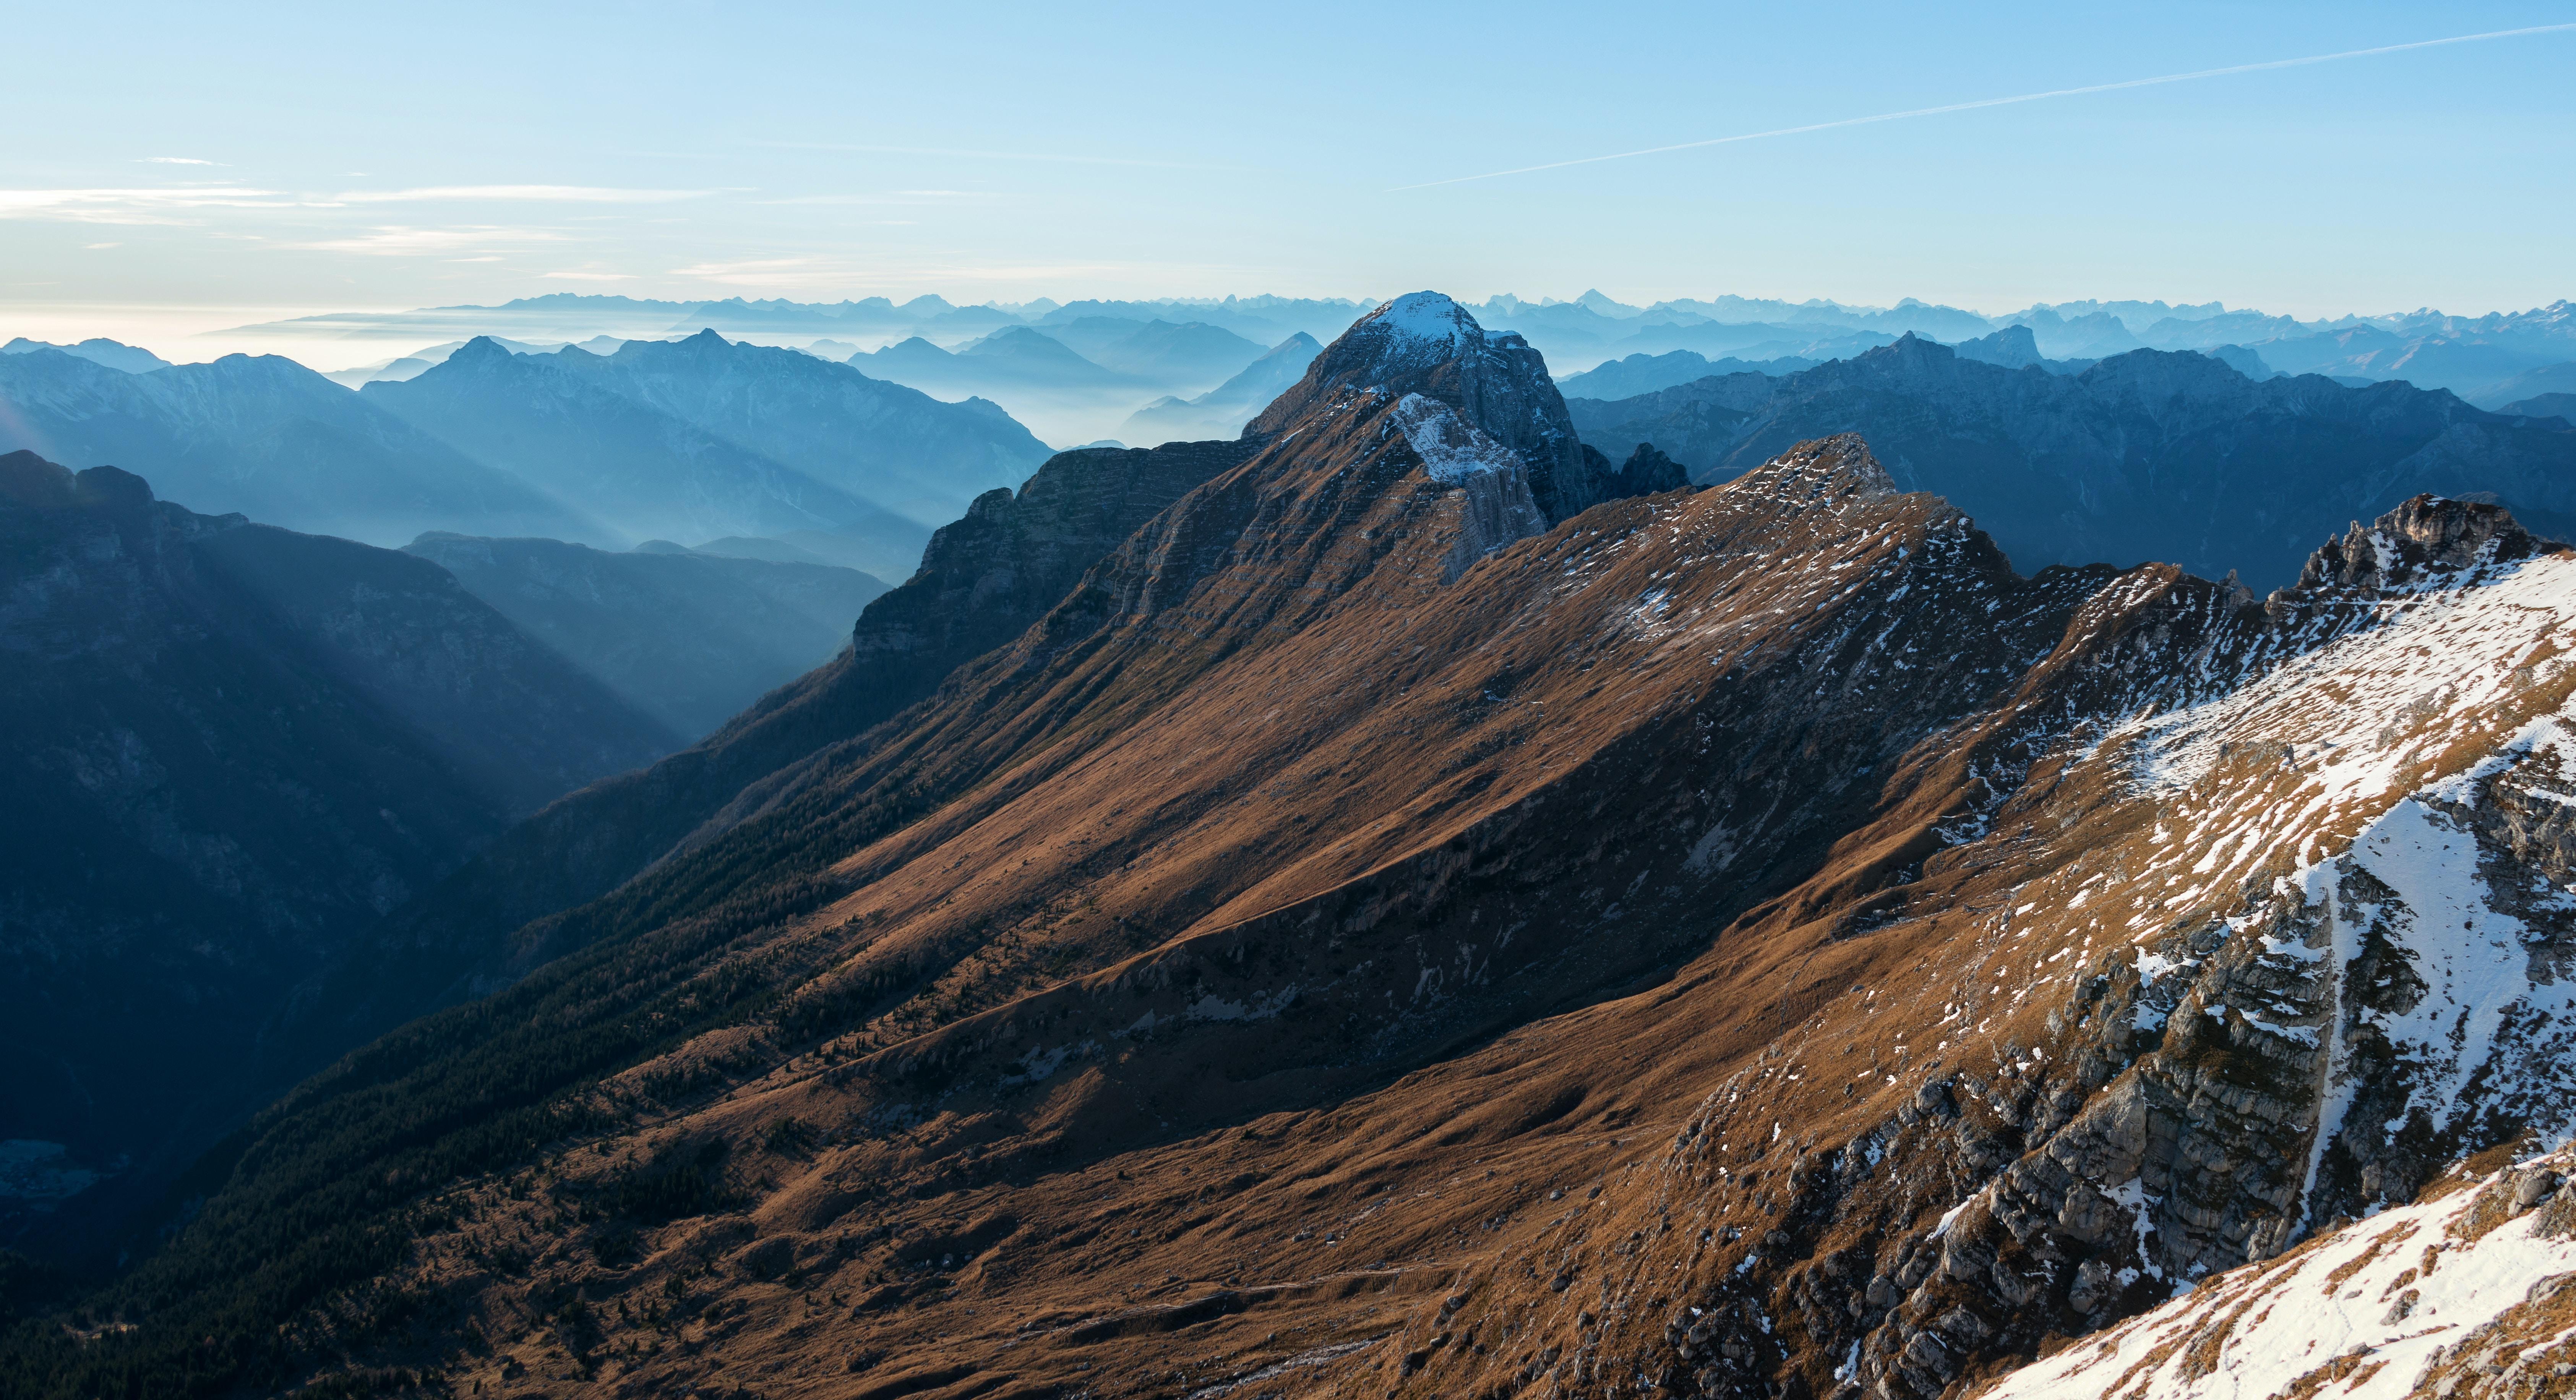 landscape of mountain under blue sky